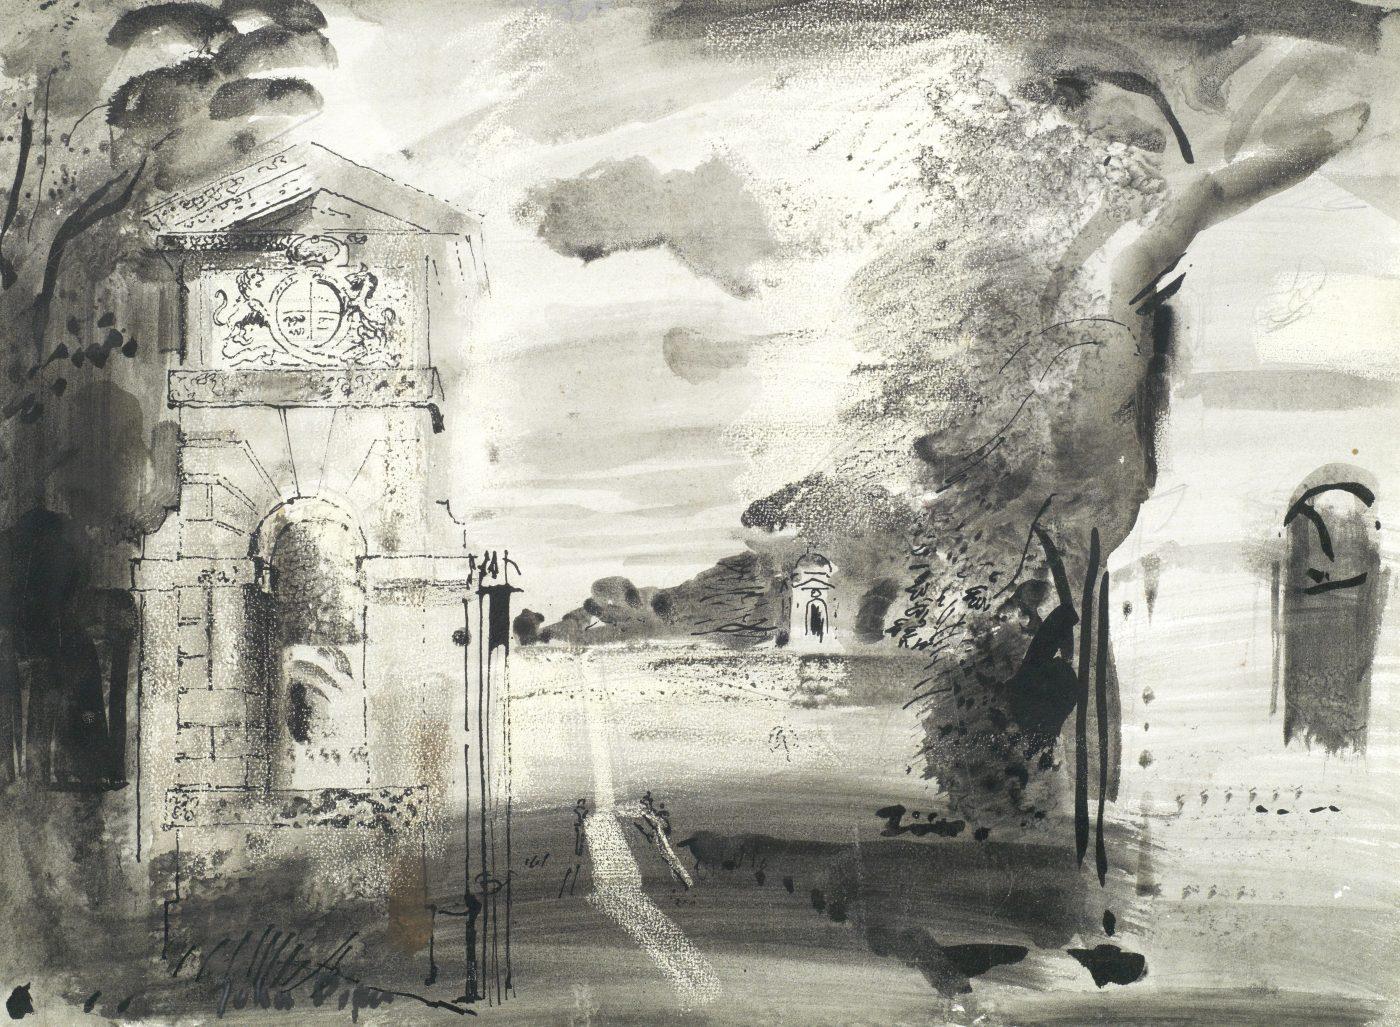 John Piper, CH (1903-1992), The Oxford Gates, Stowe